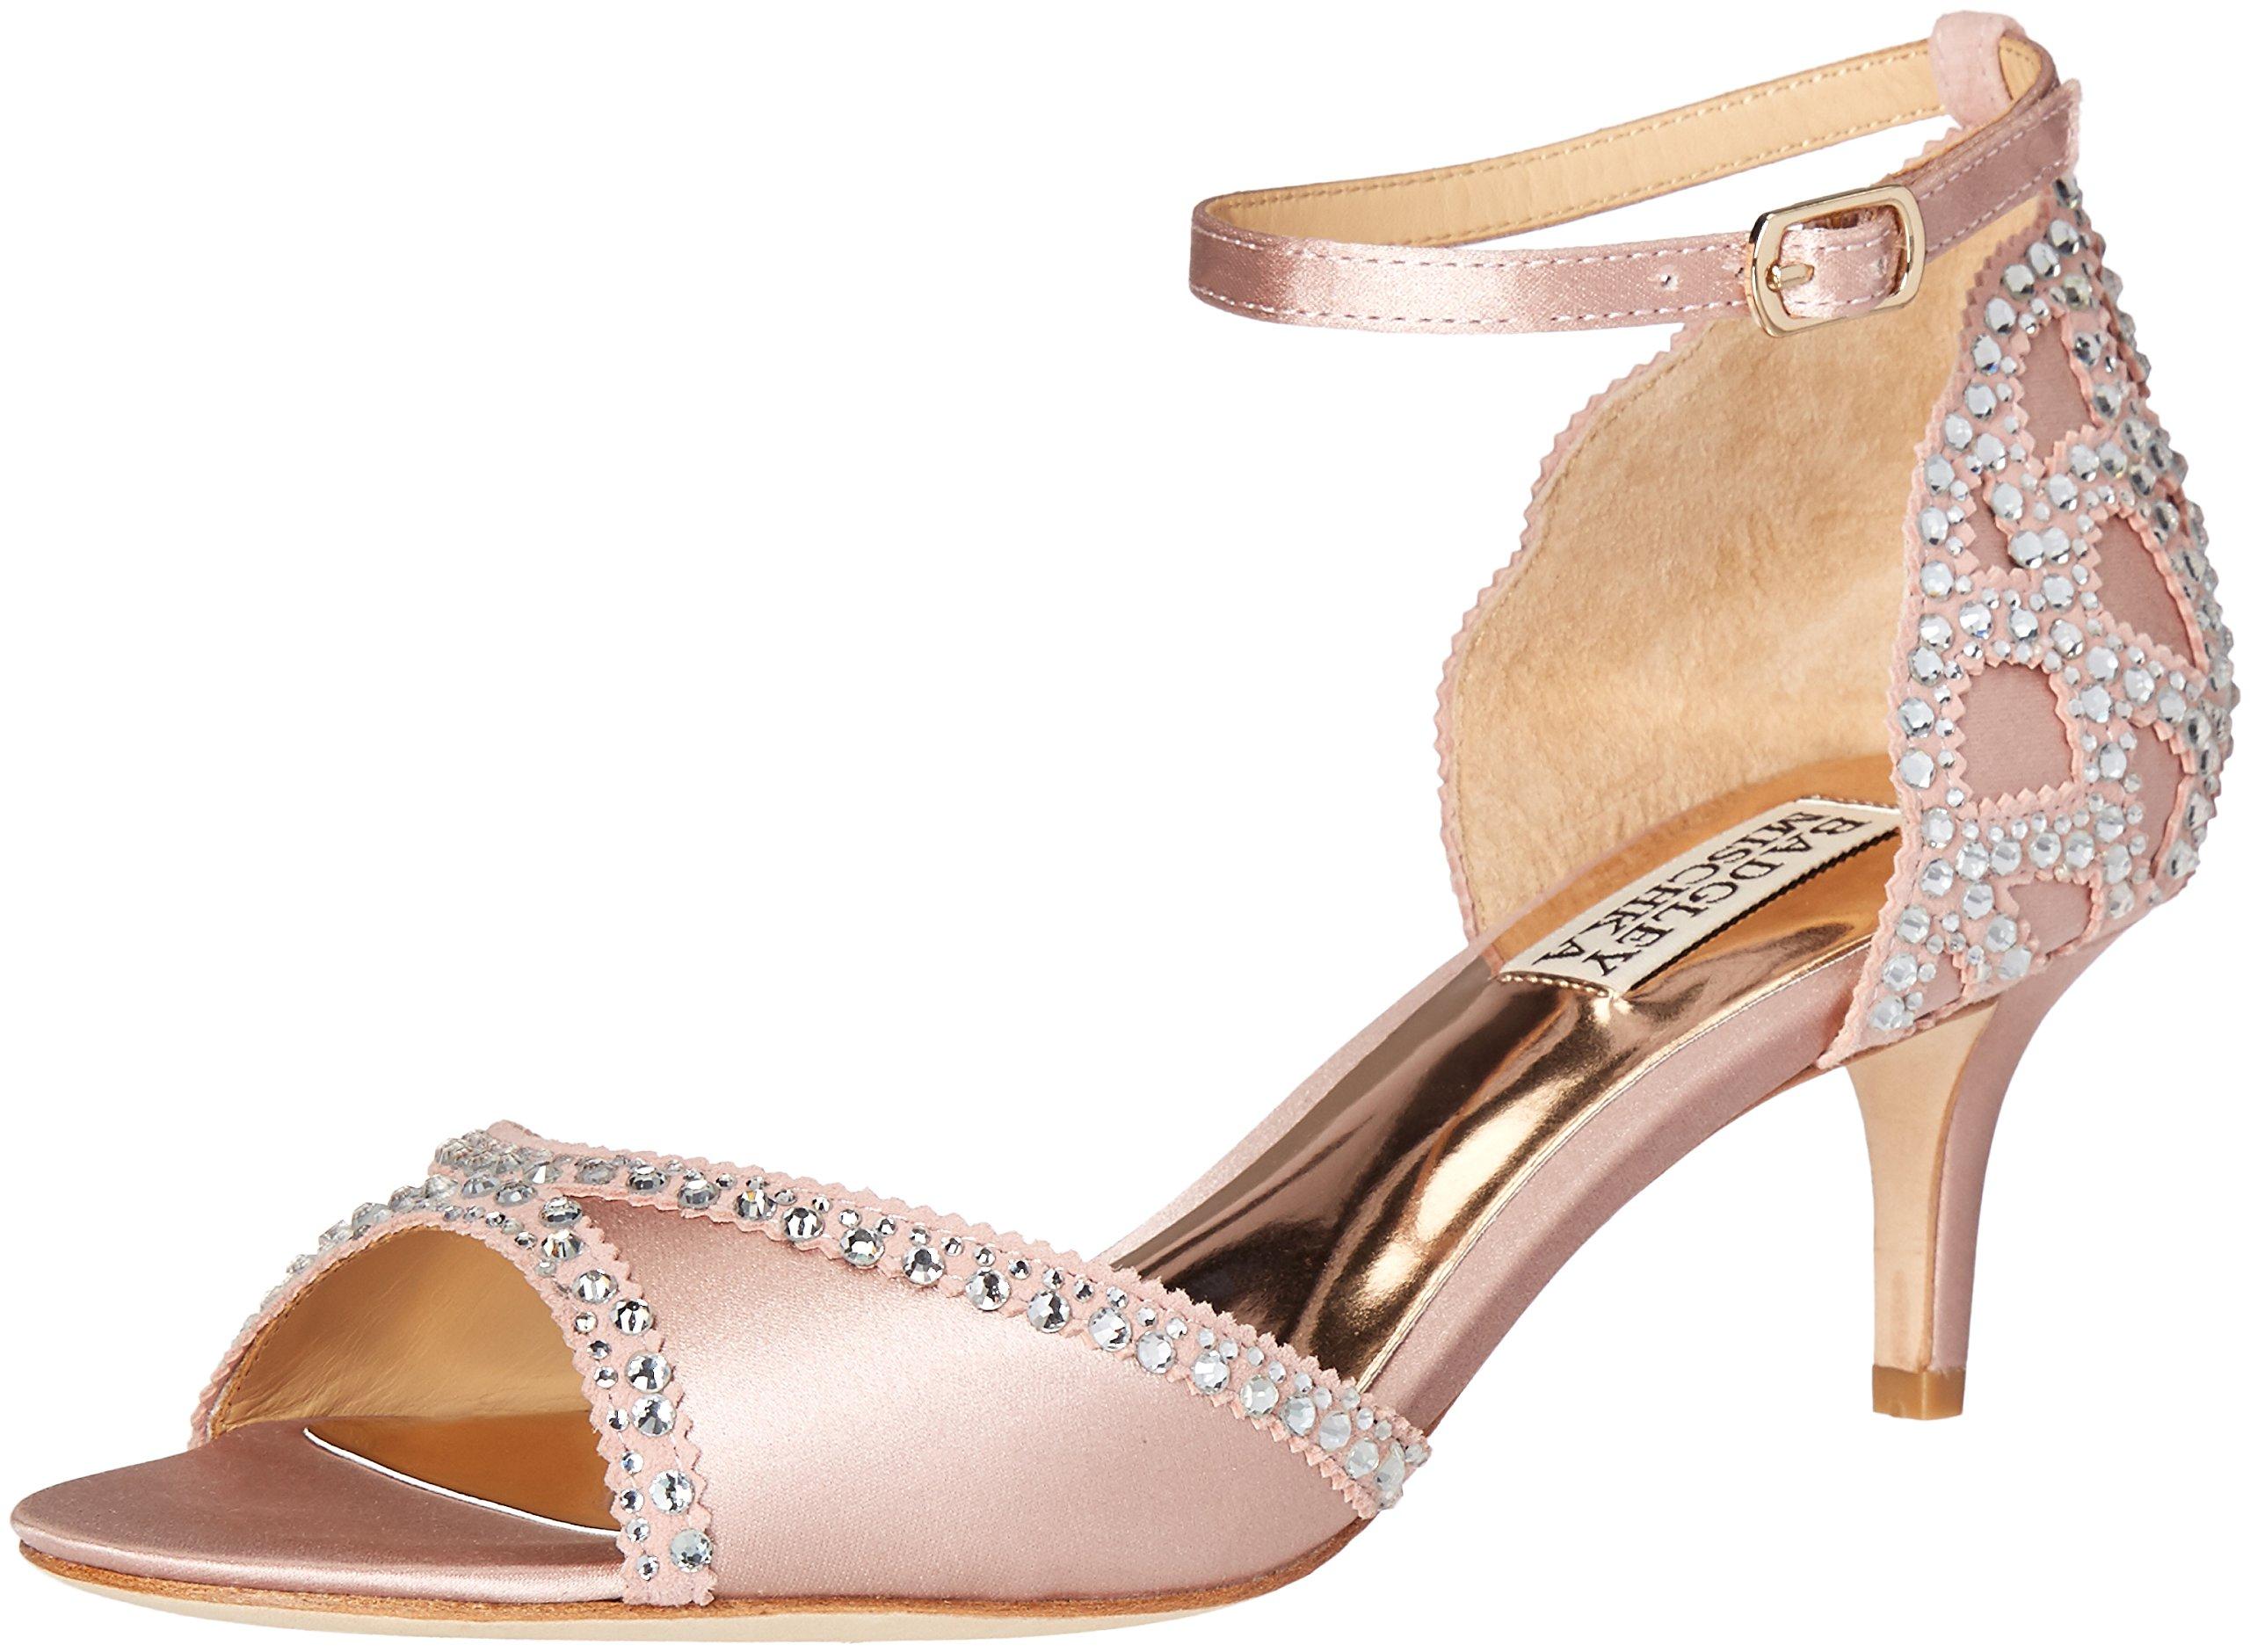 Badgley Mischka Women's Gillian Dress Sandal, Blush, 7 M US